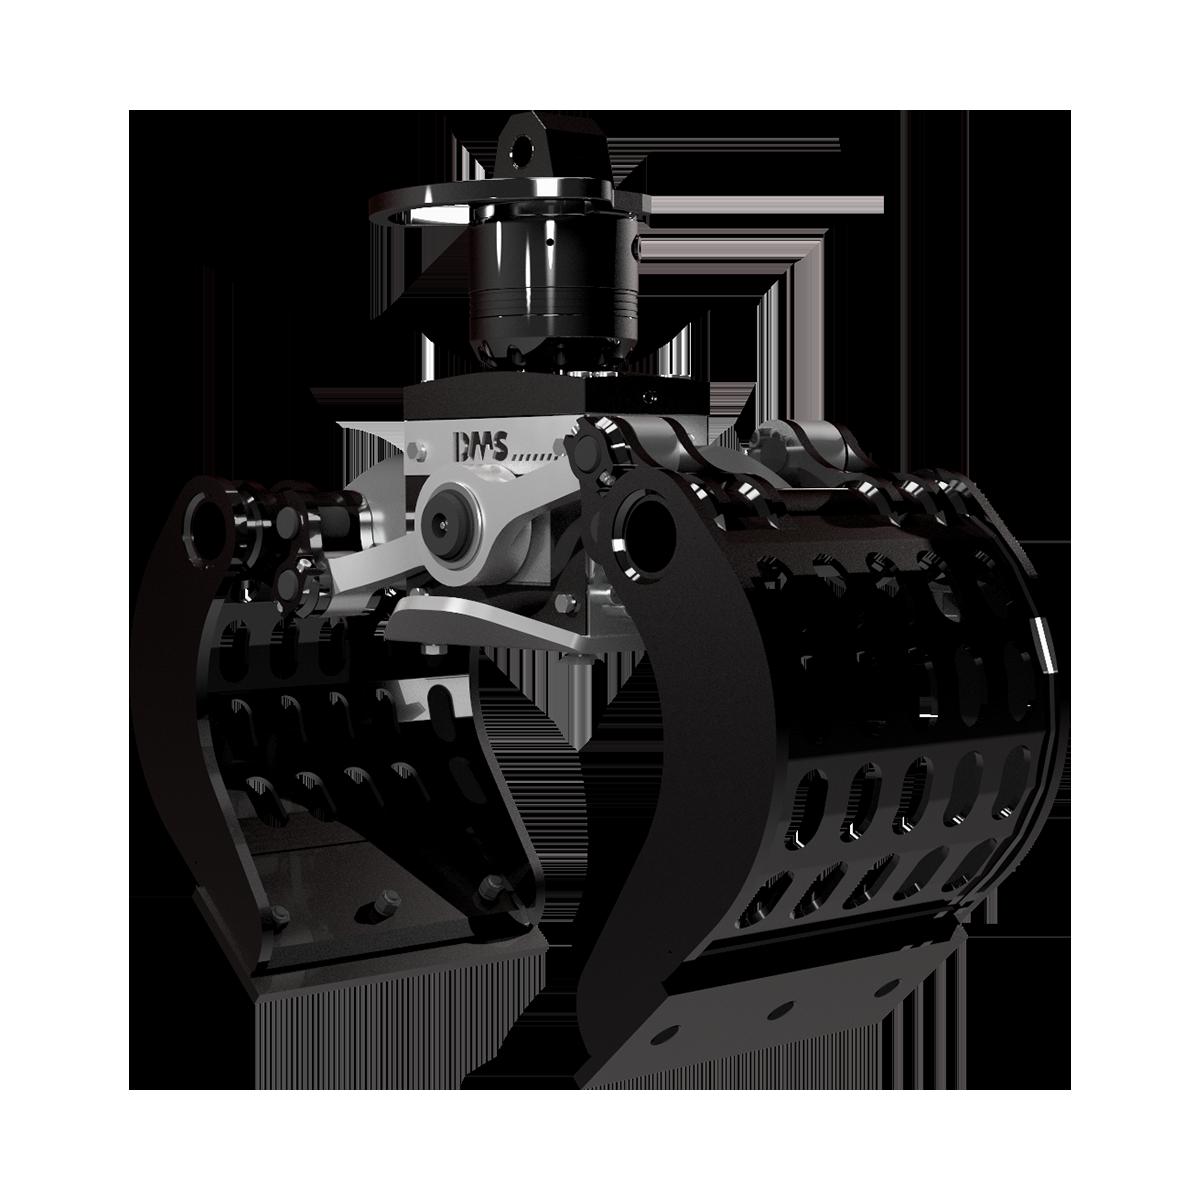 Ladekran Abbruchgreifer AG6040p von DMS Technologie